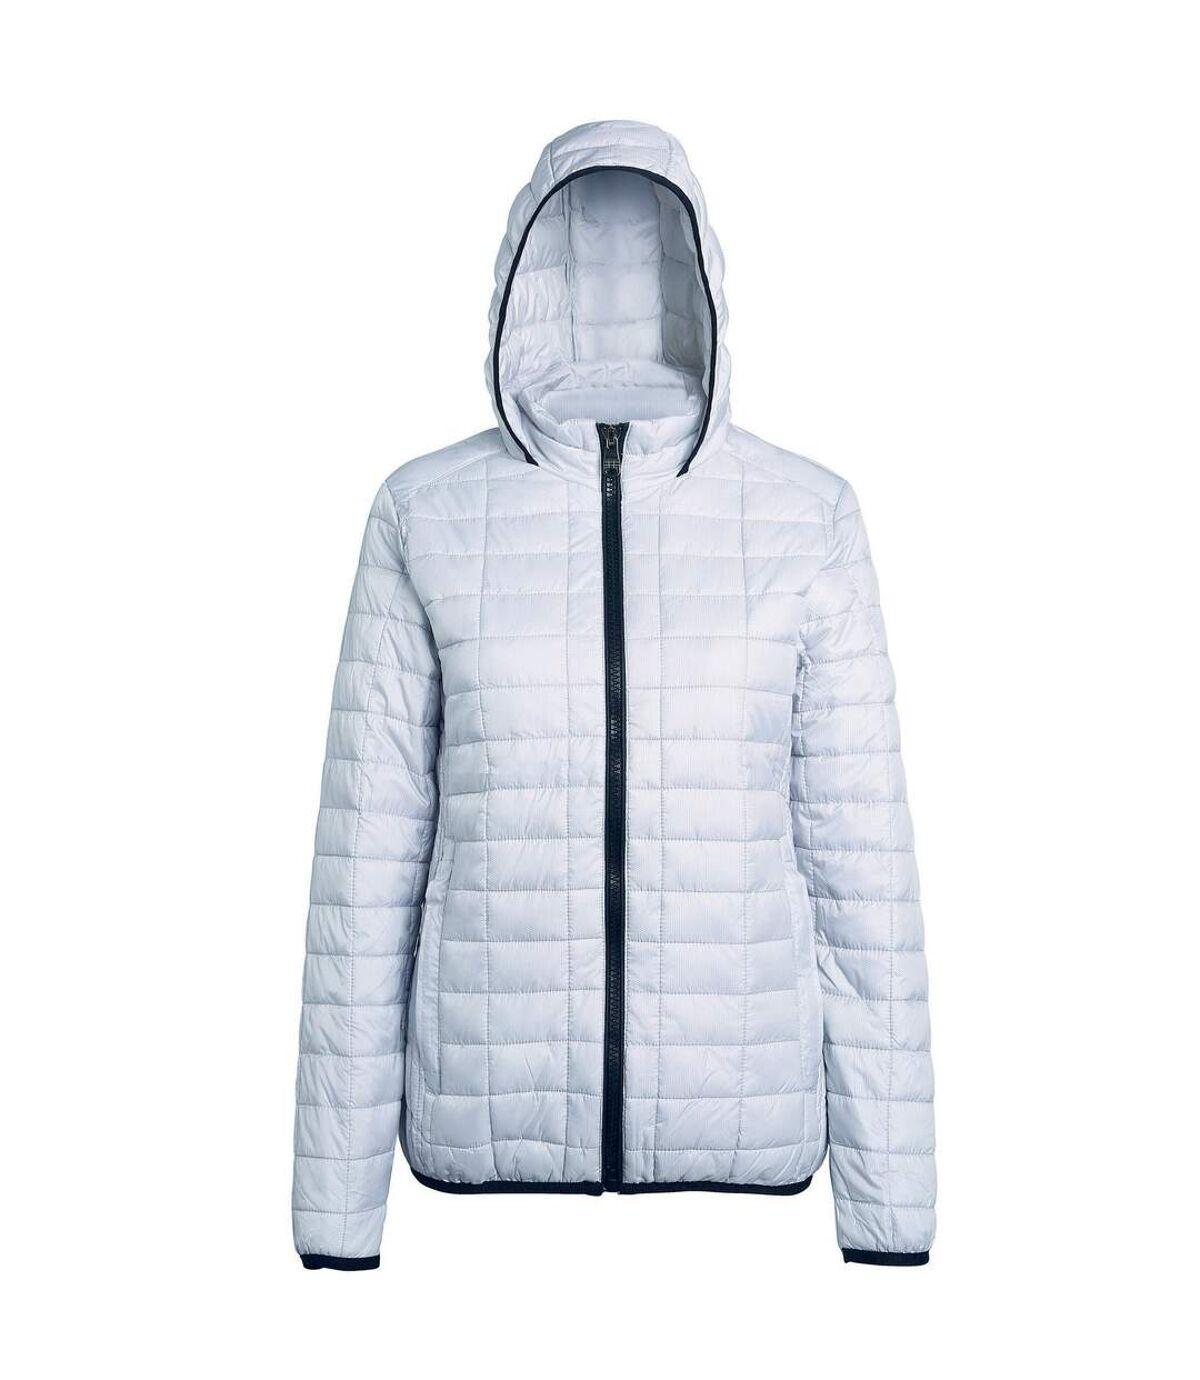 2786 Mens Honeycomb Padded Hooded Jacket (White) - UTRW5018